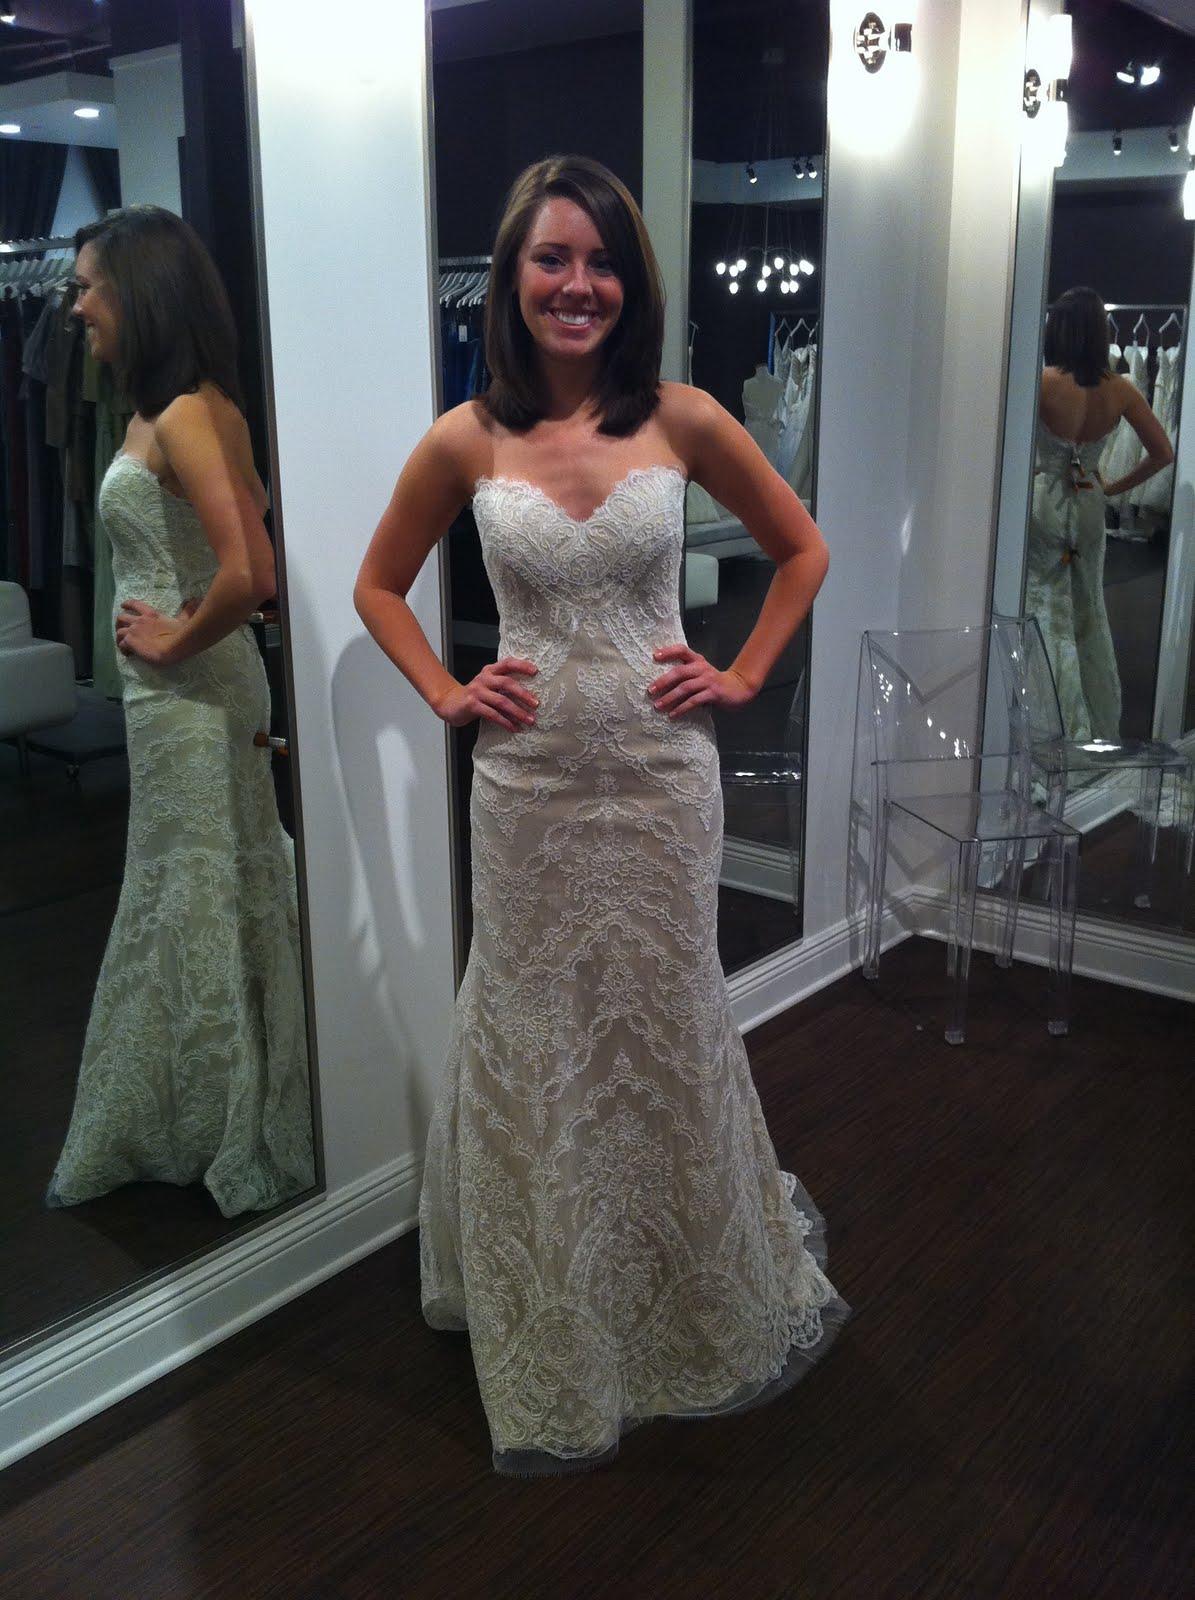 Sash or no sash with my lace dress?